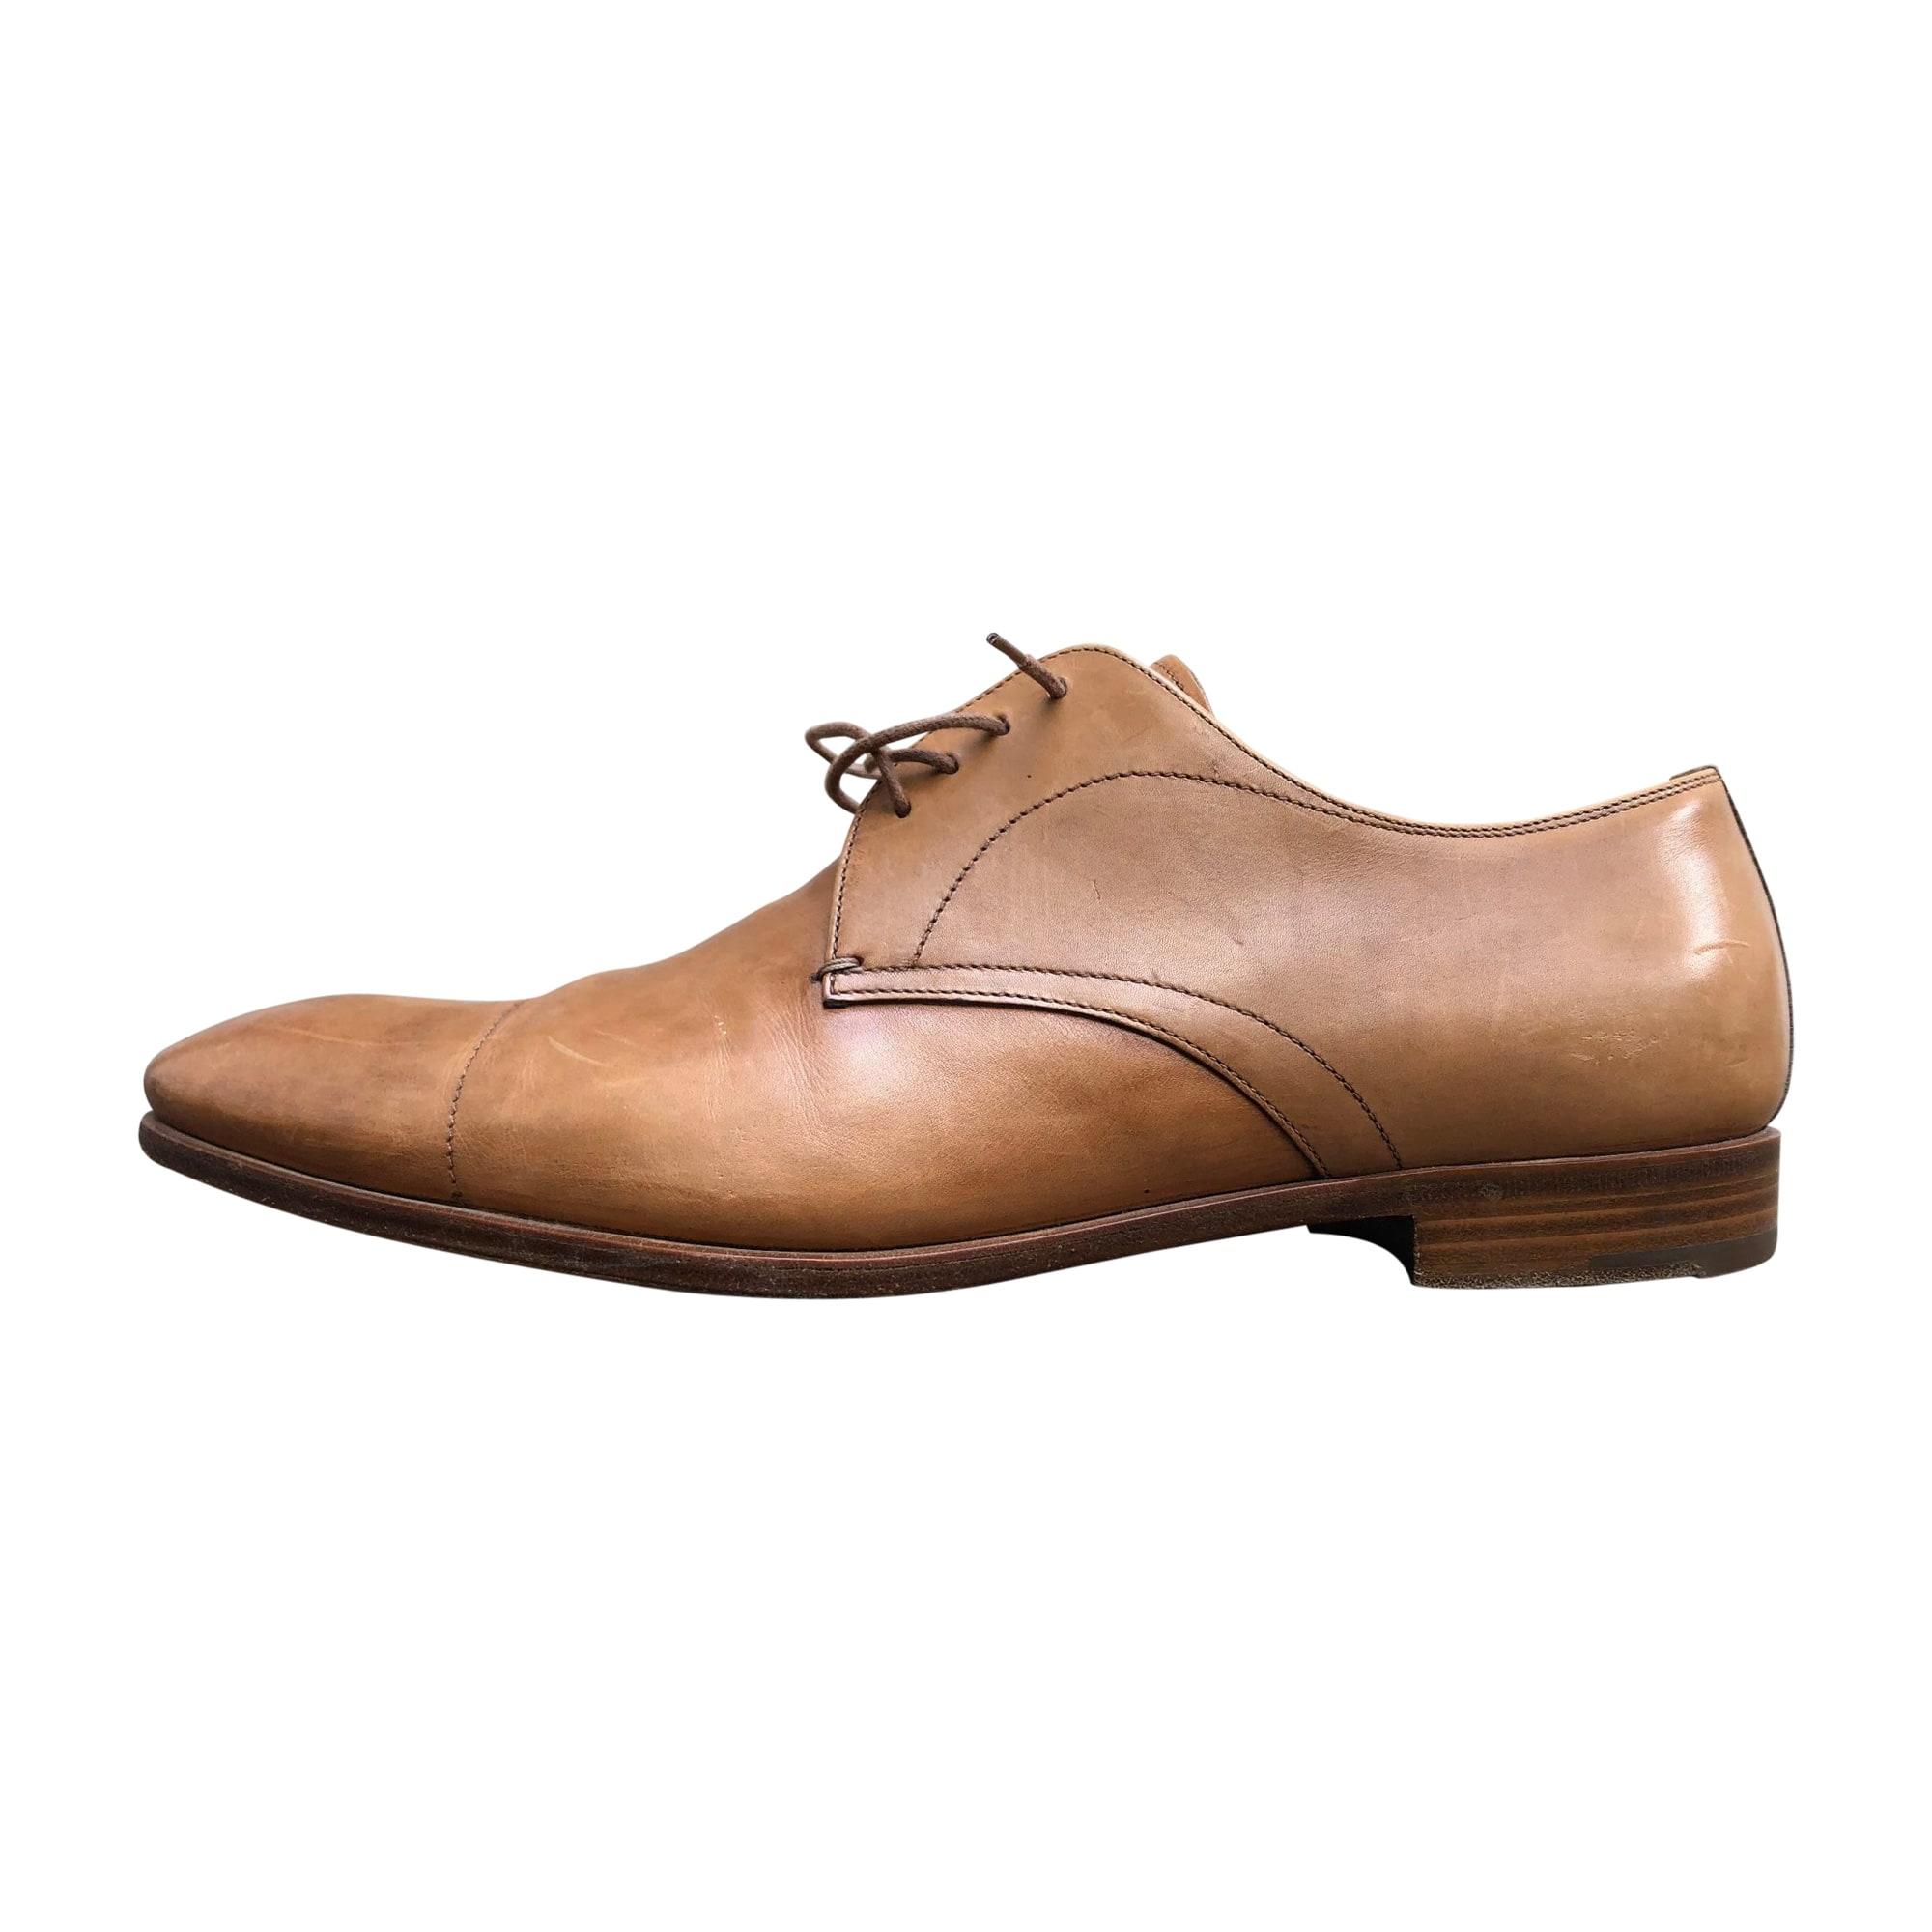 Lace Up Shoes PRADA Beige, camel